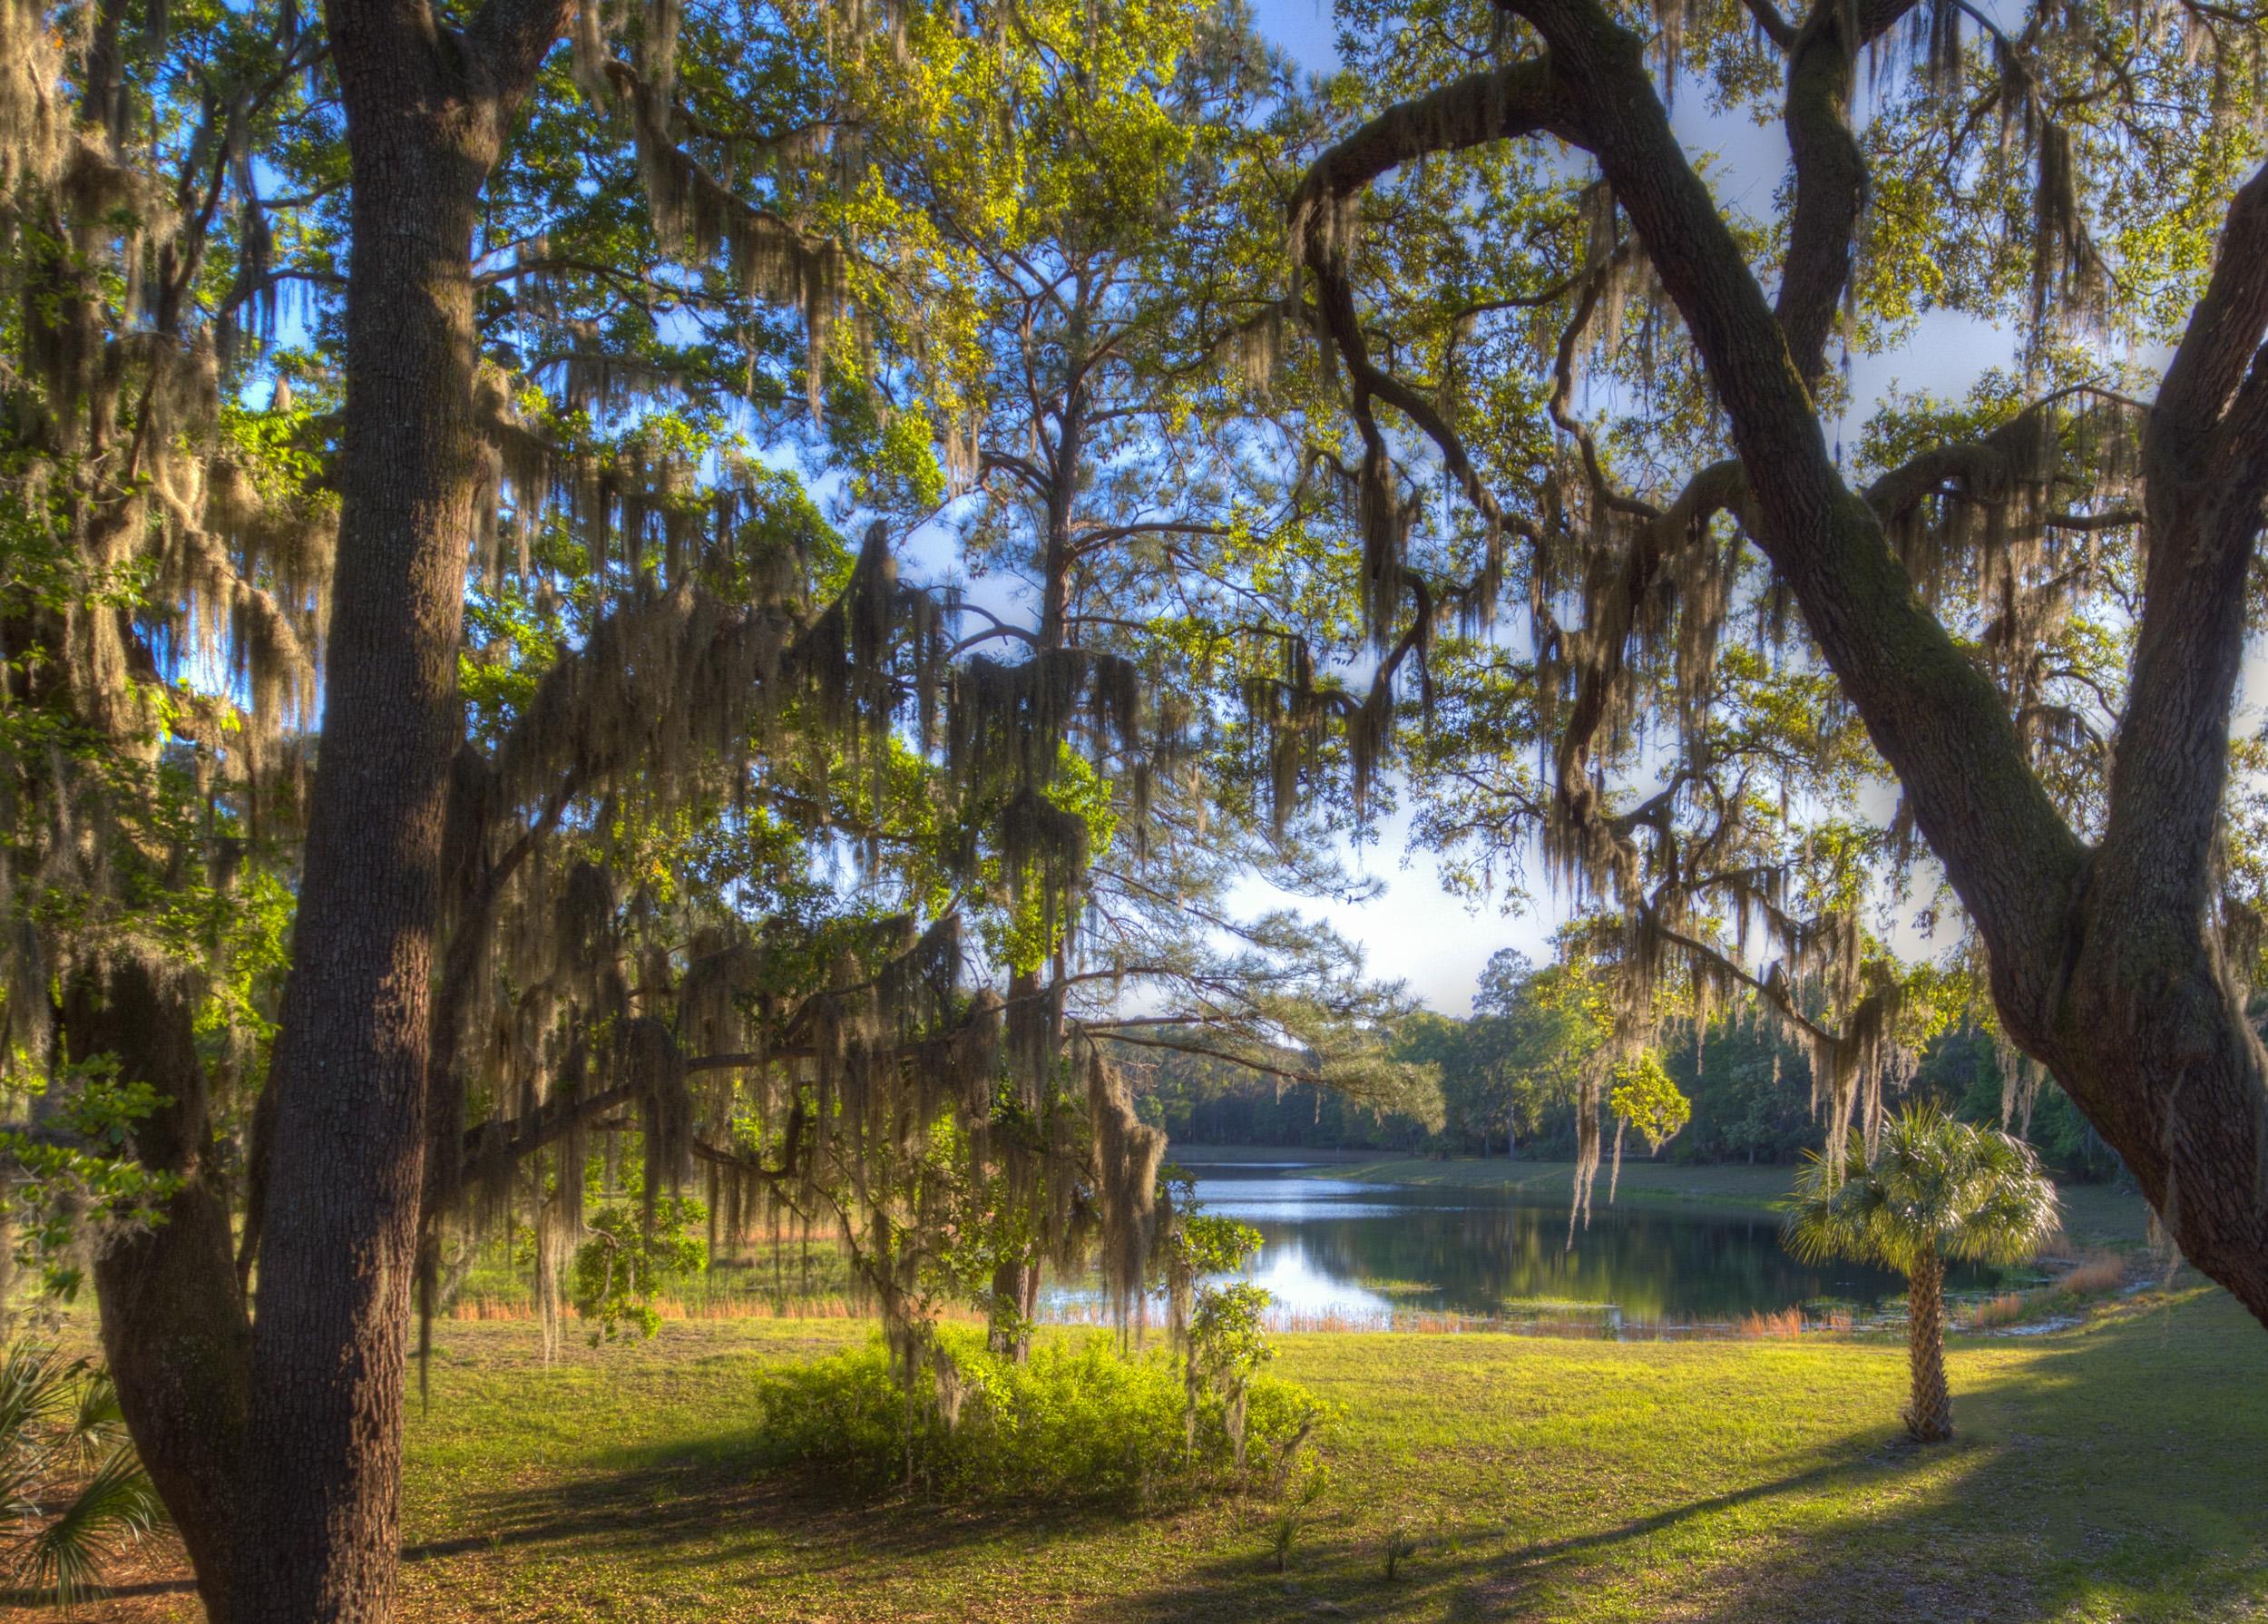 pond-view-tree.jpg